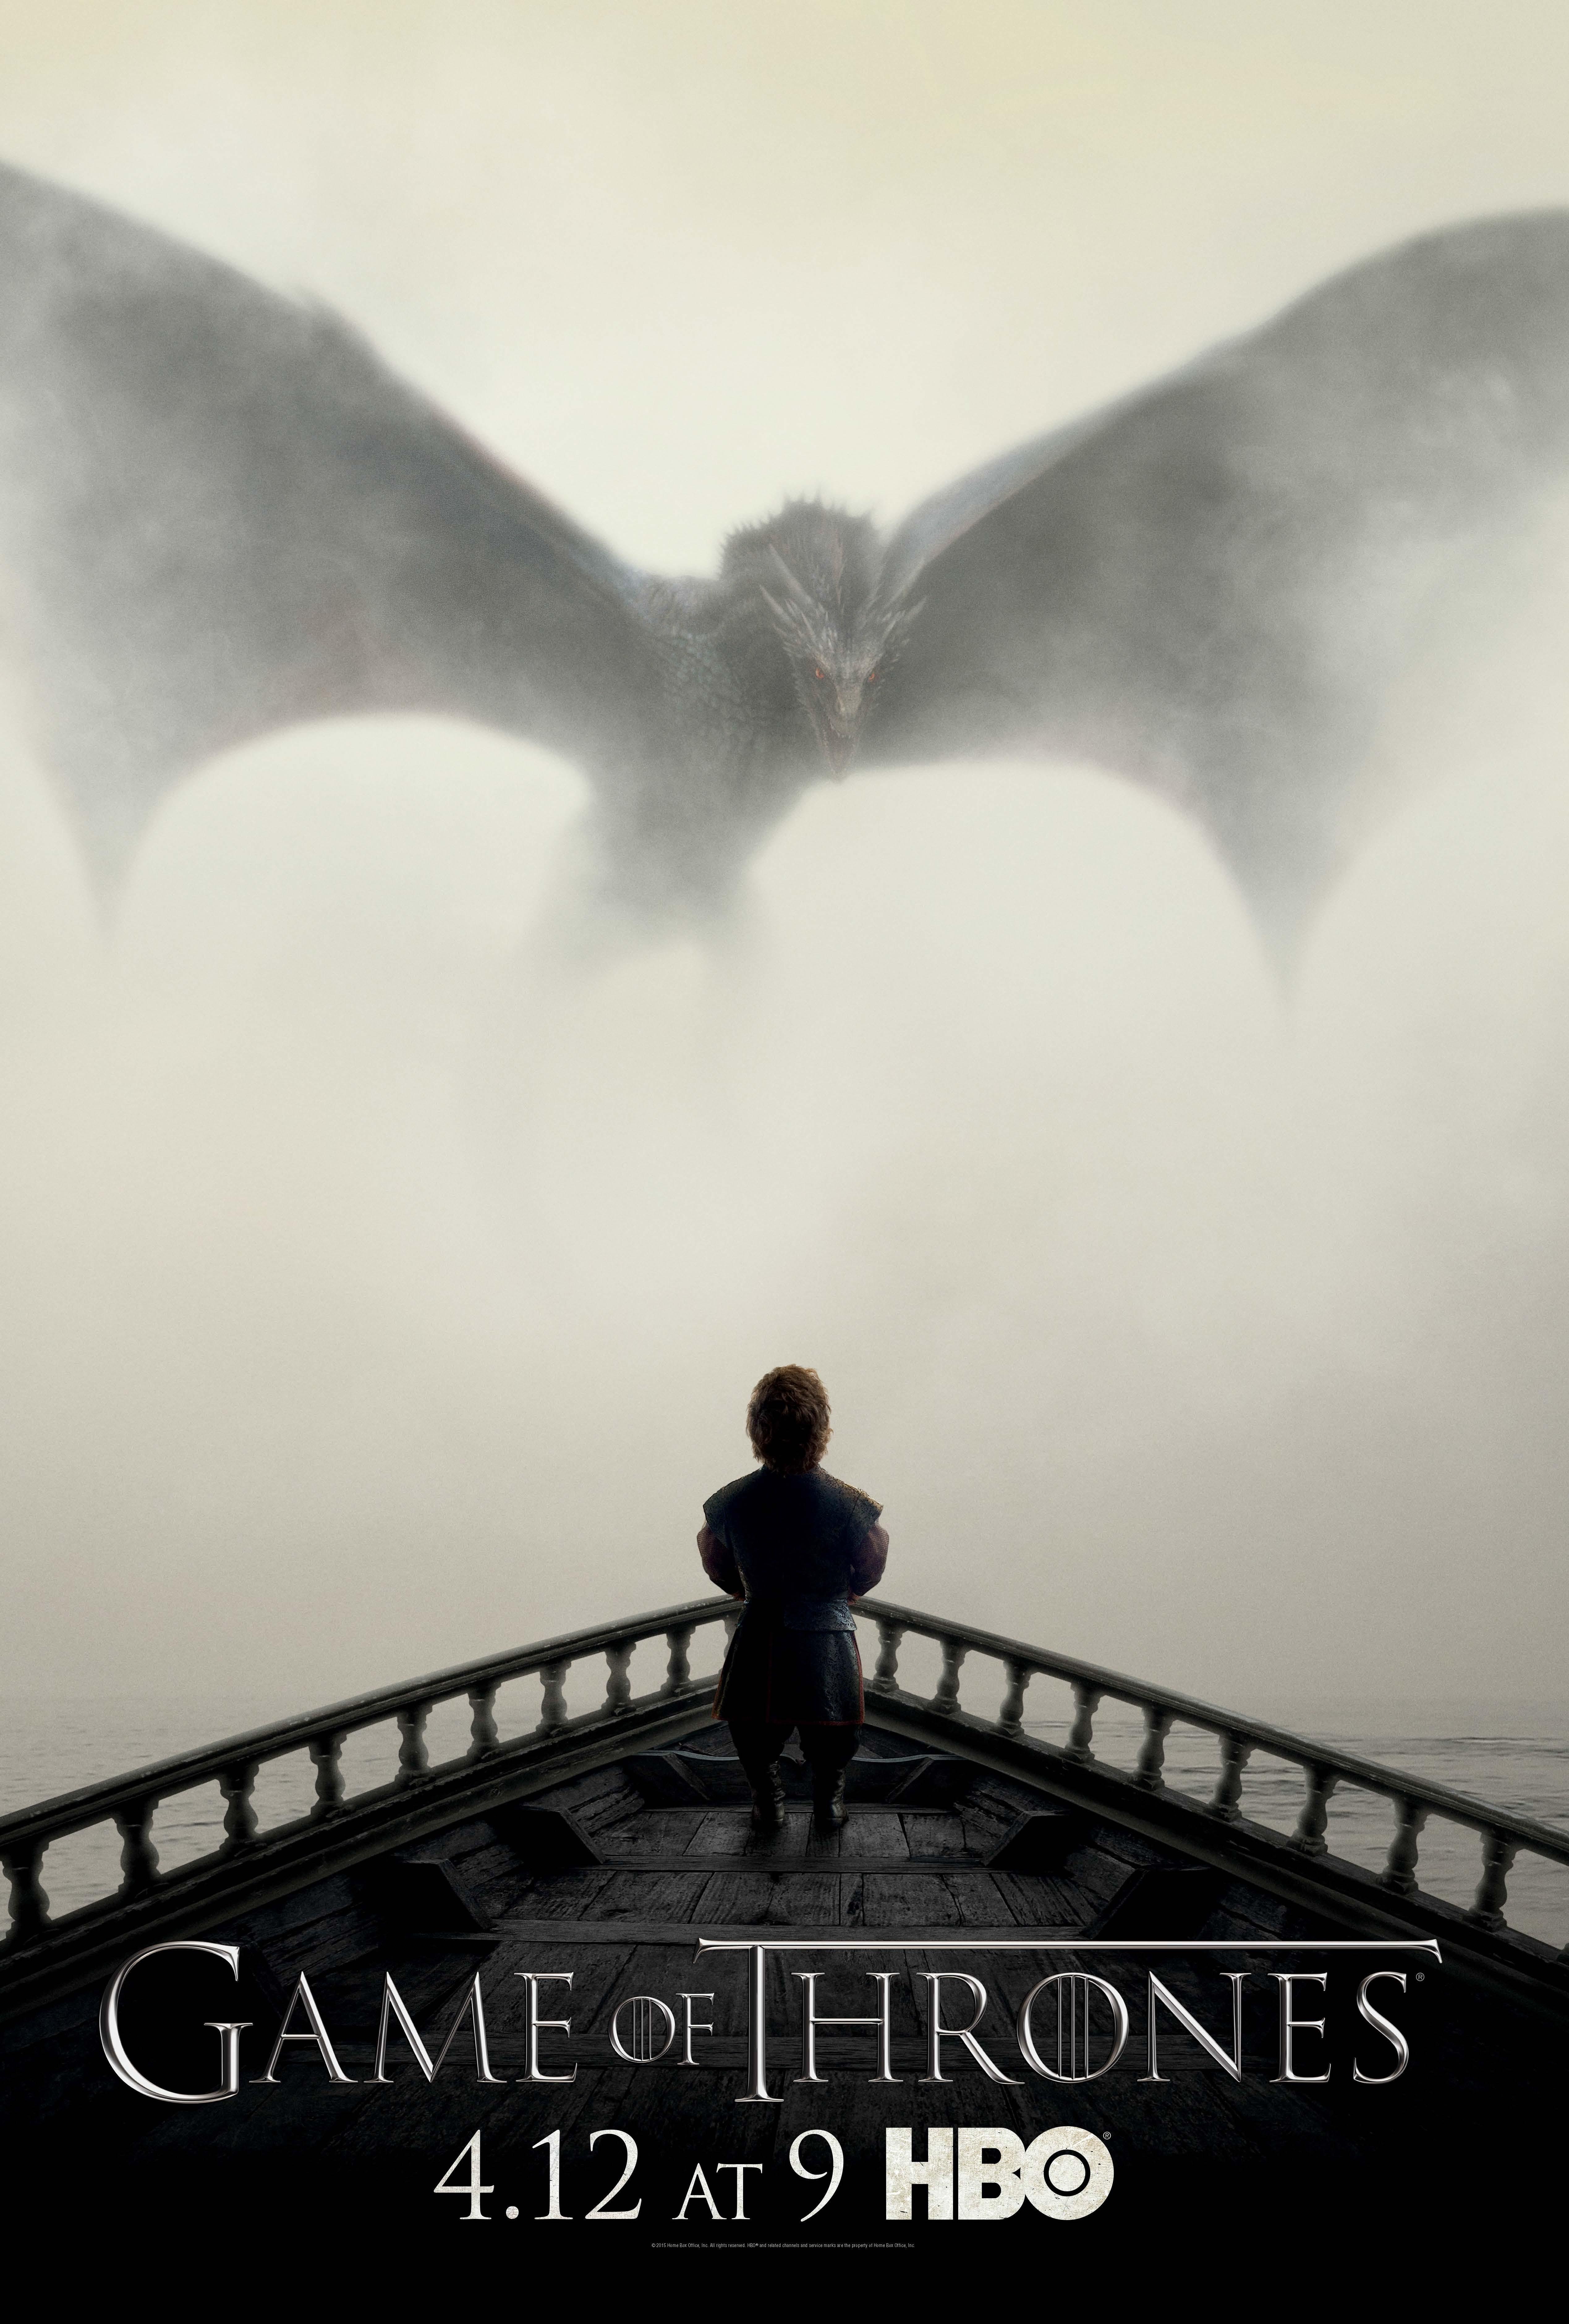 Gameofthrones-season5_poster.jpg